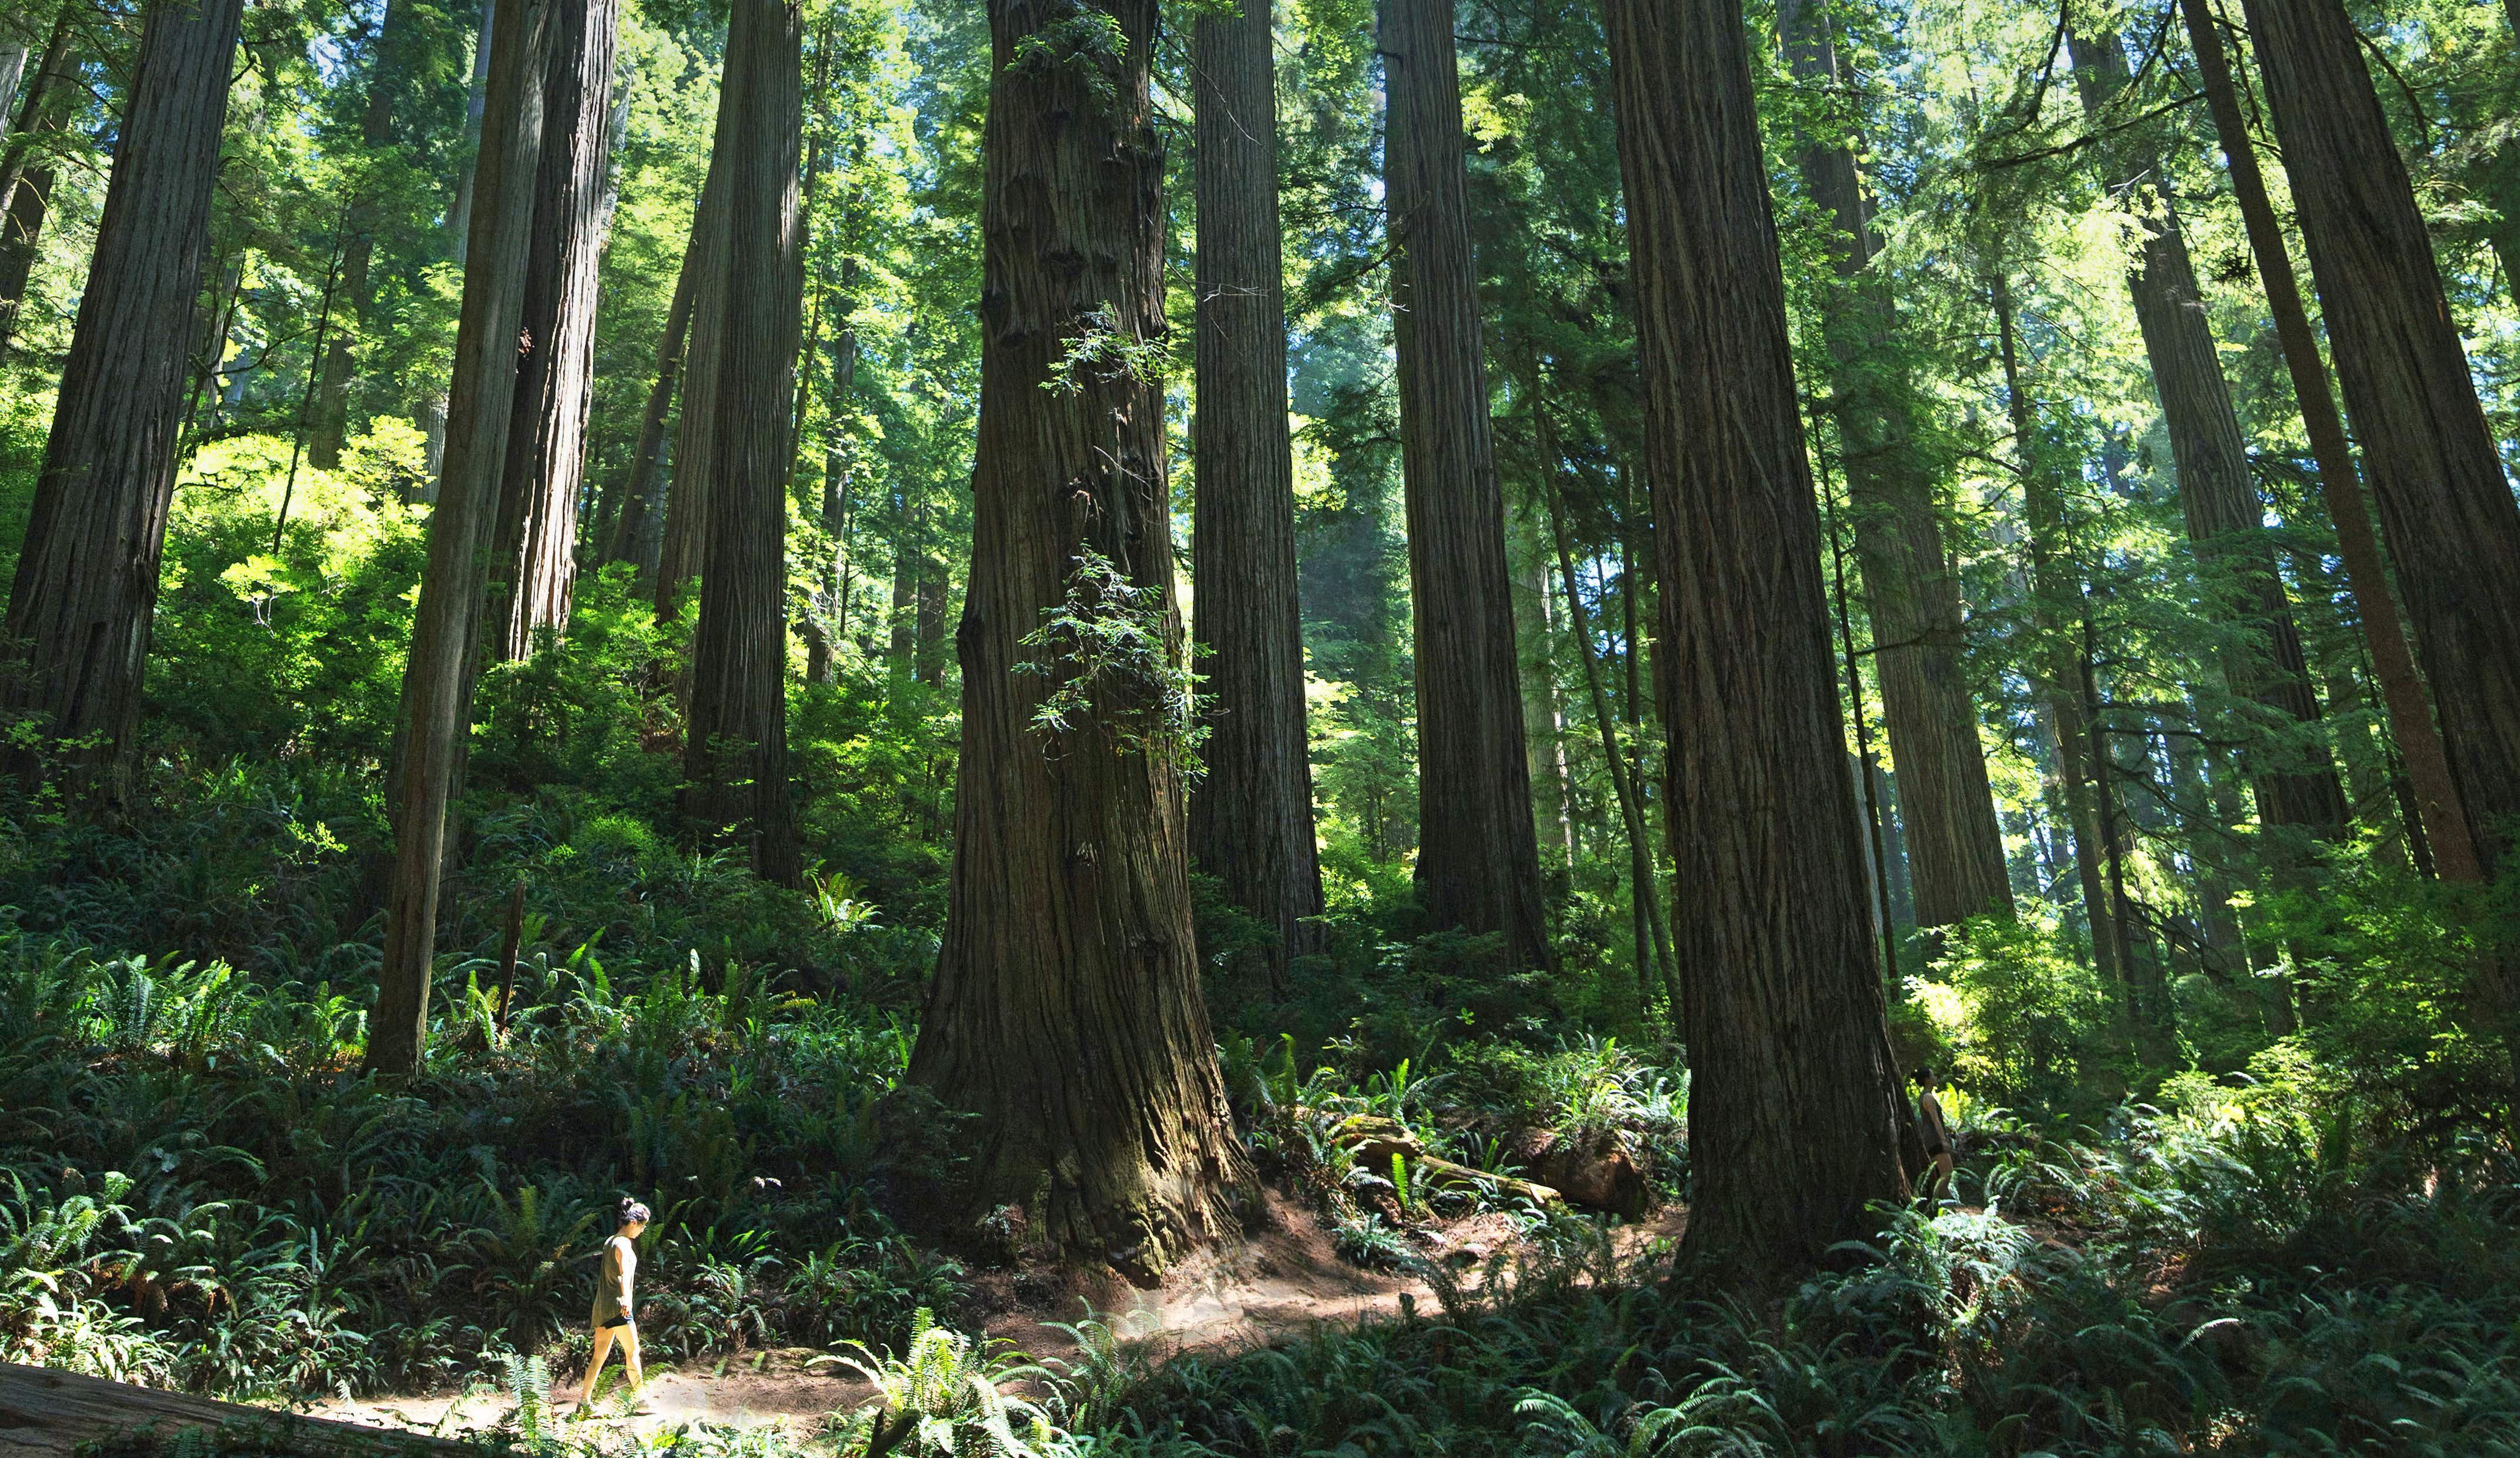 Seeking serenity: forest bathing among California's redwoods